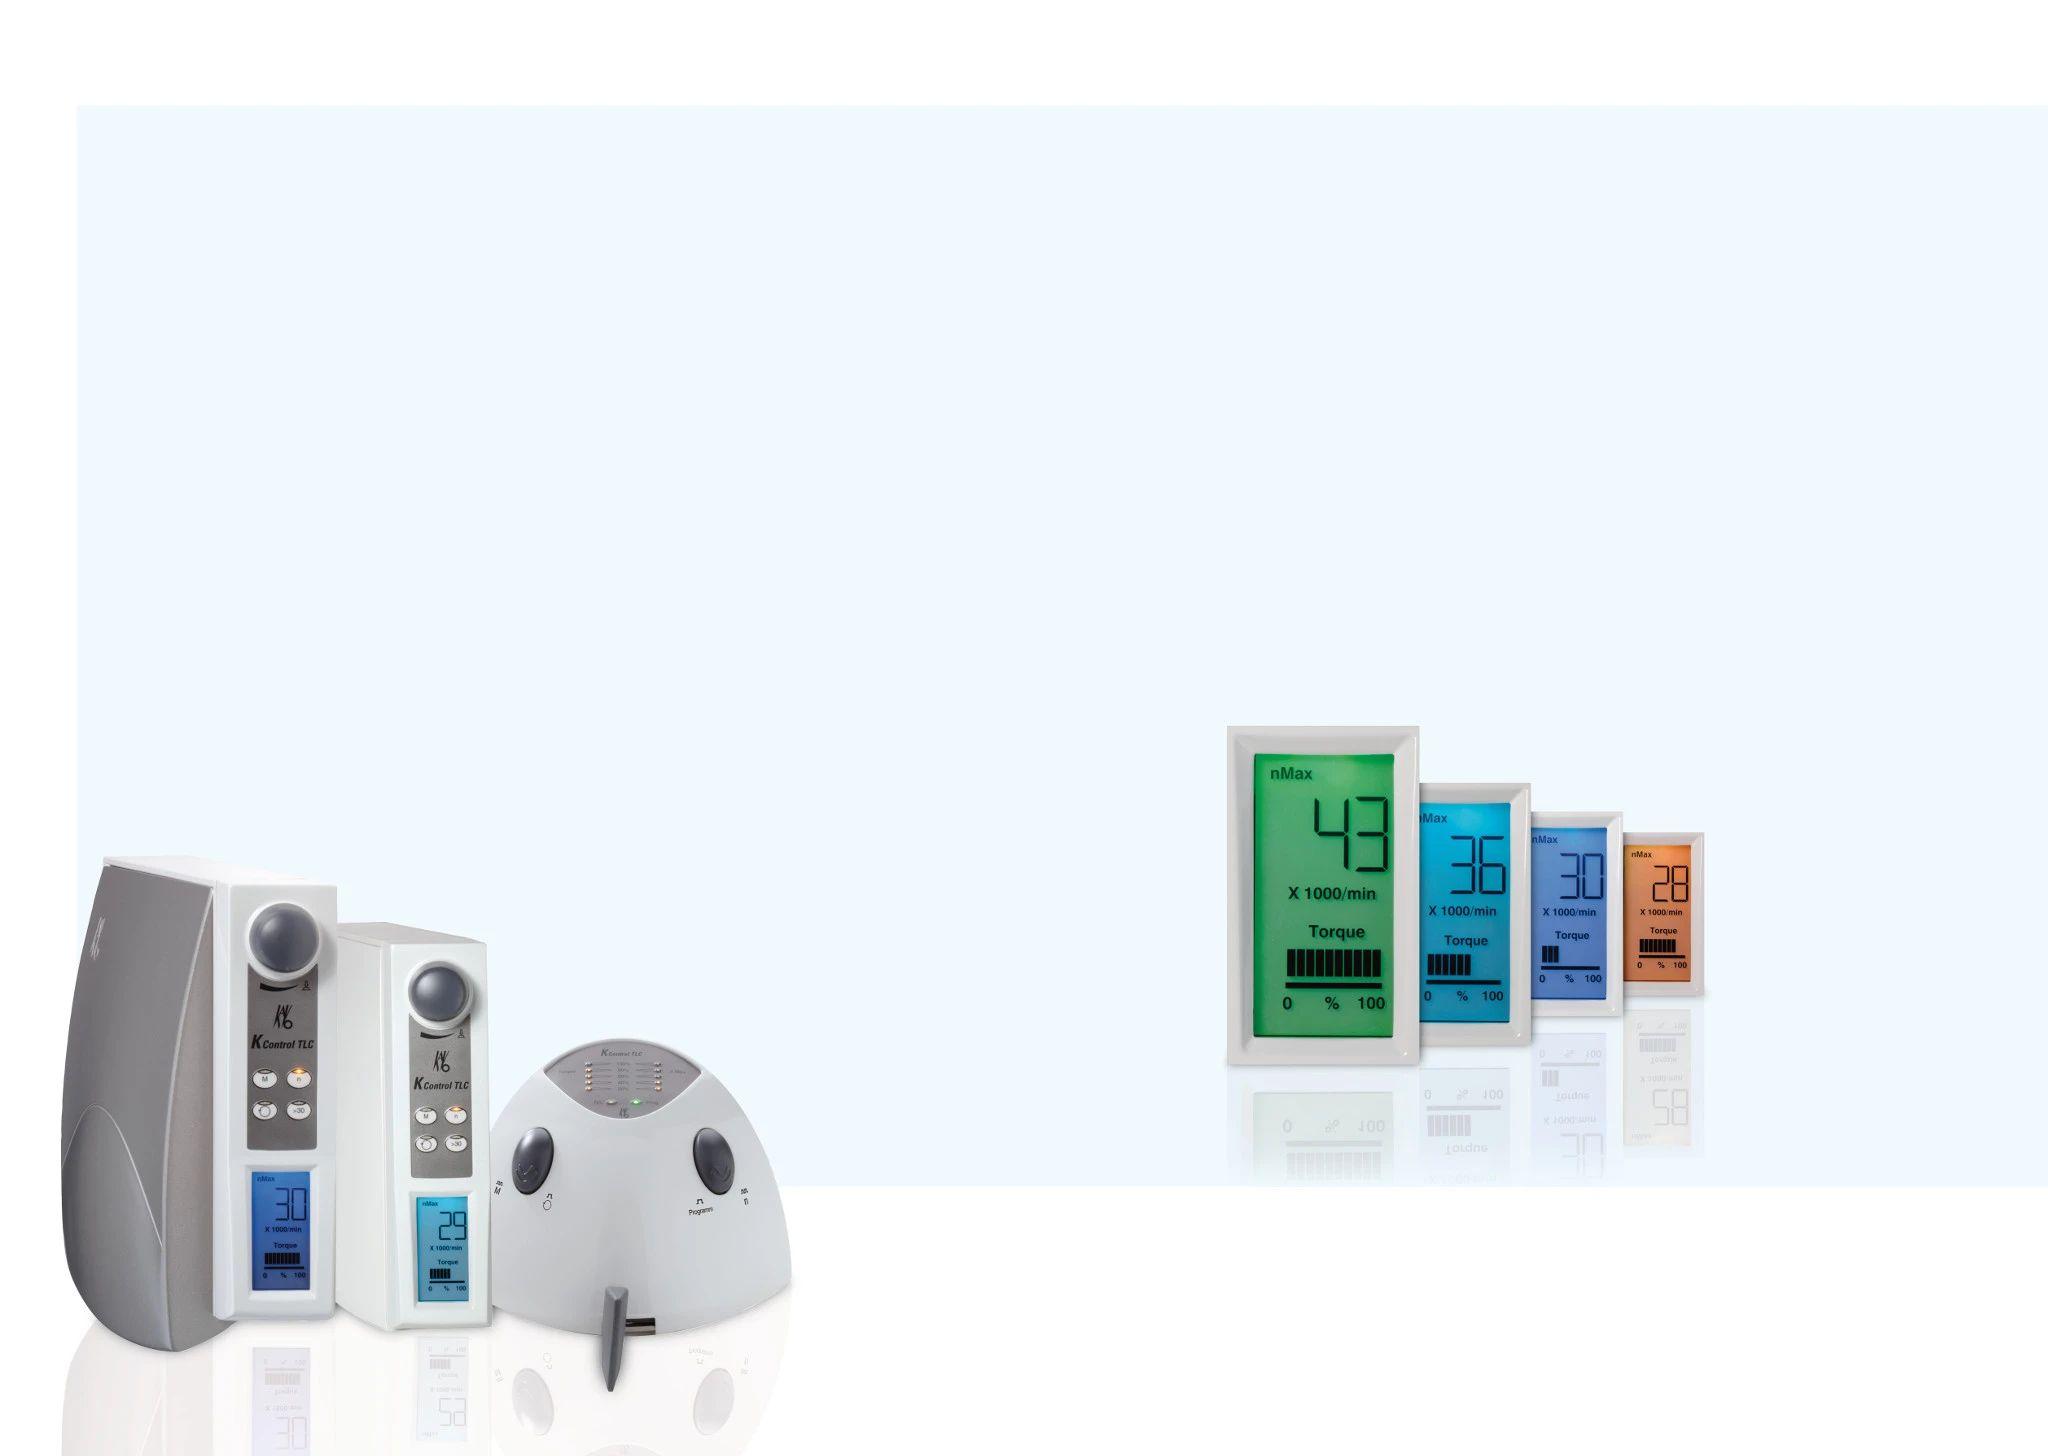 K5plus Micromotores de laboratorio